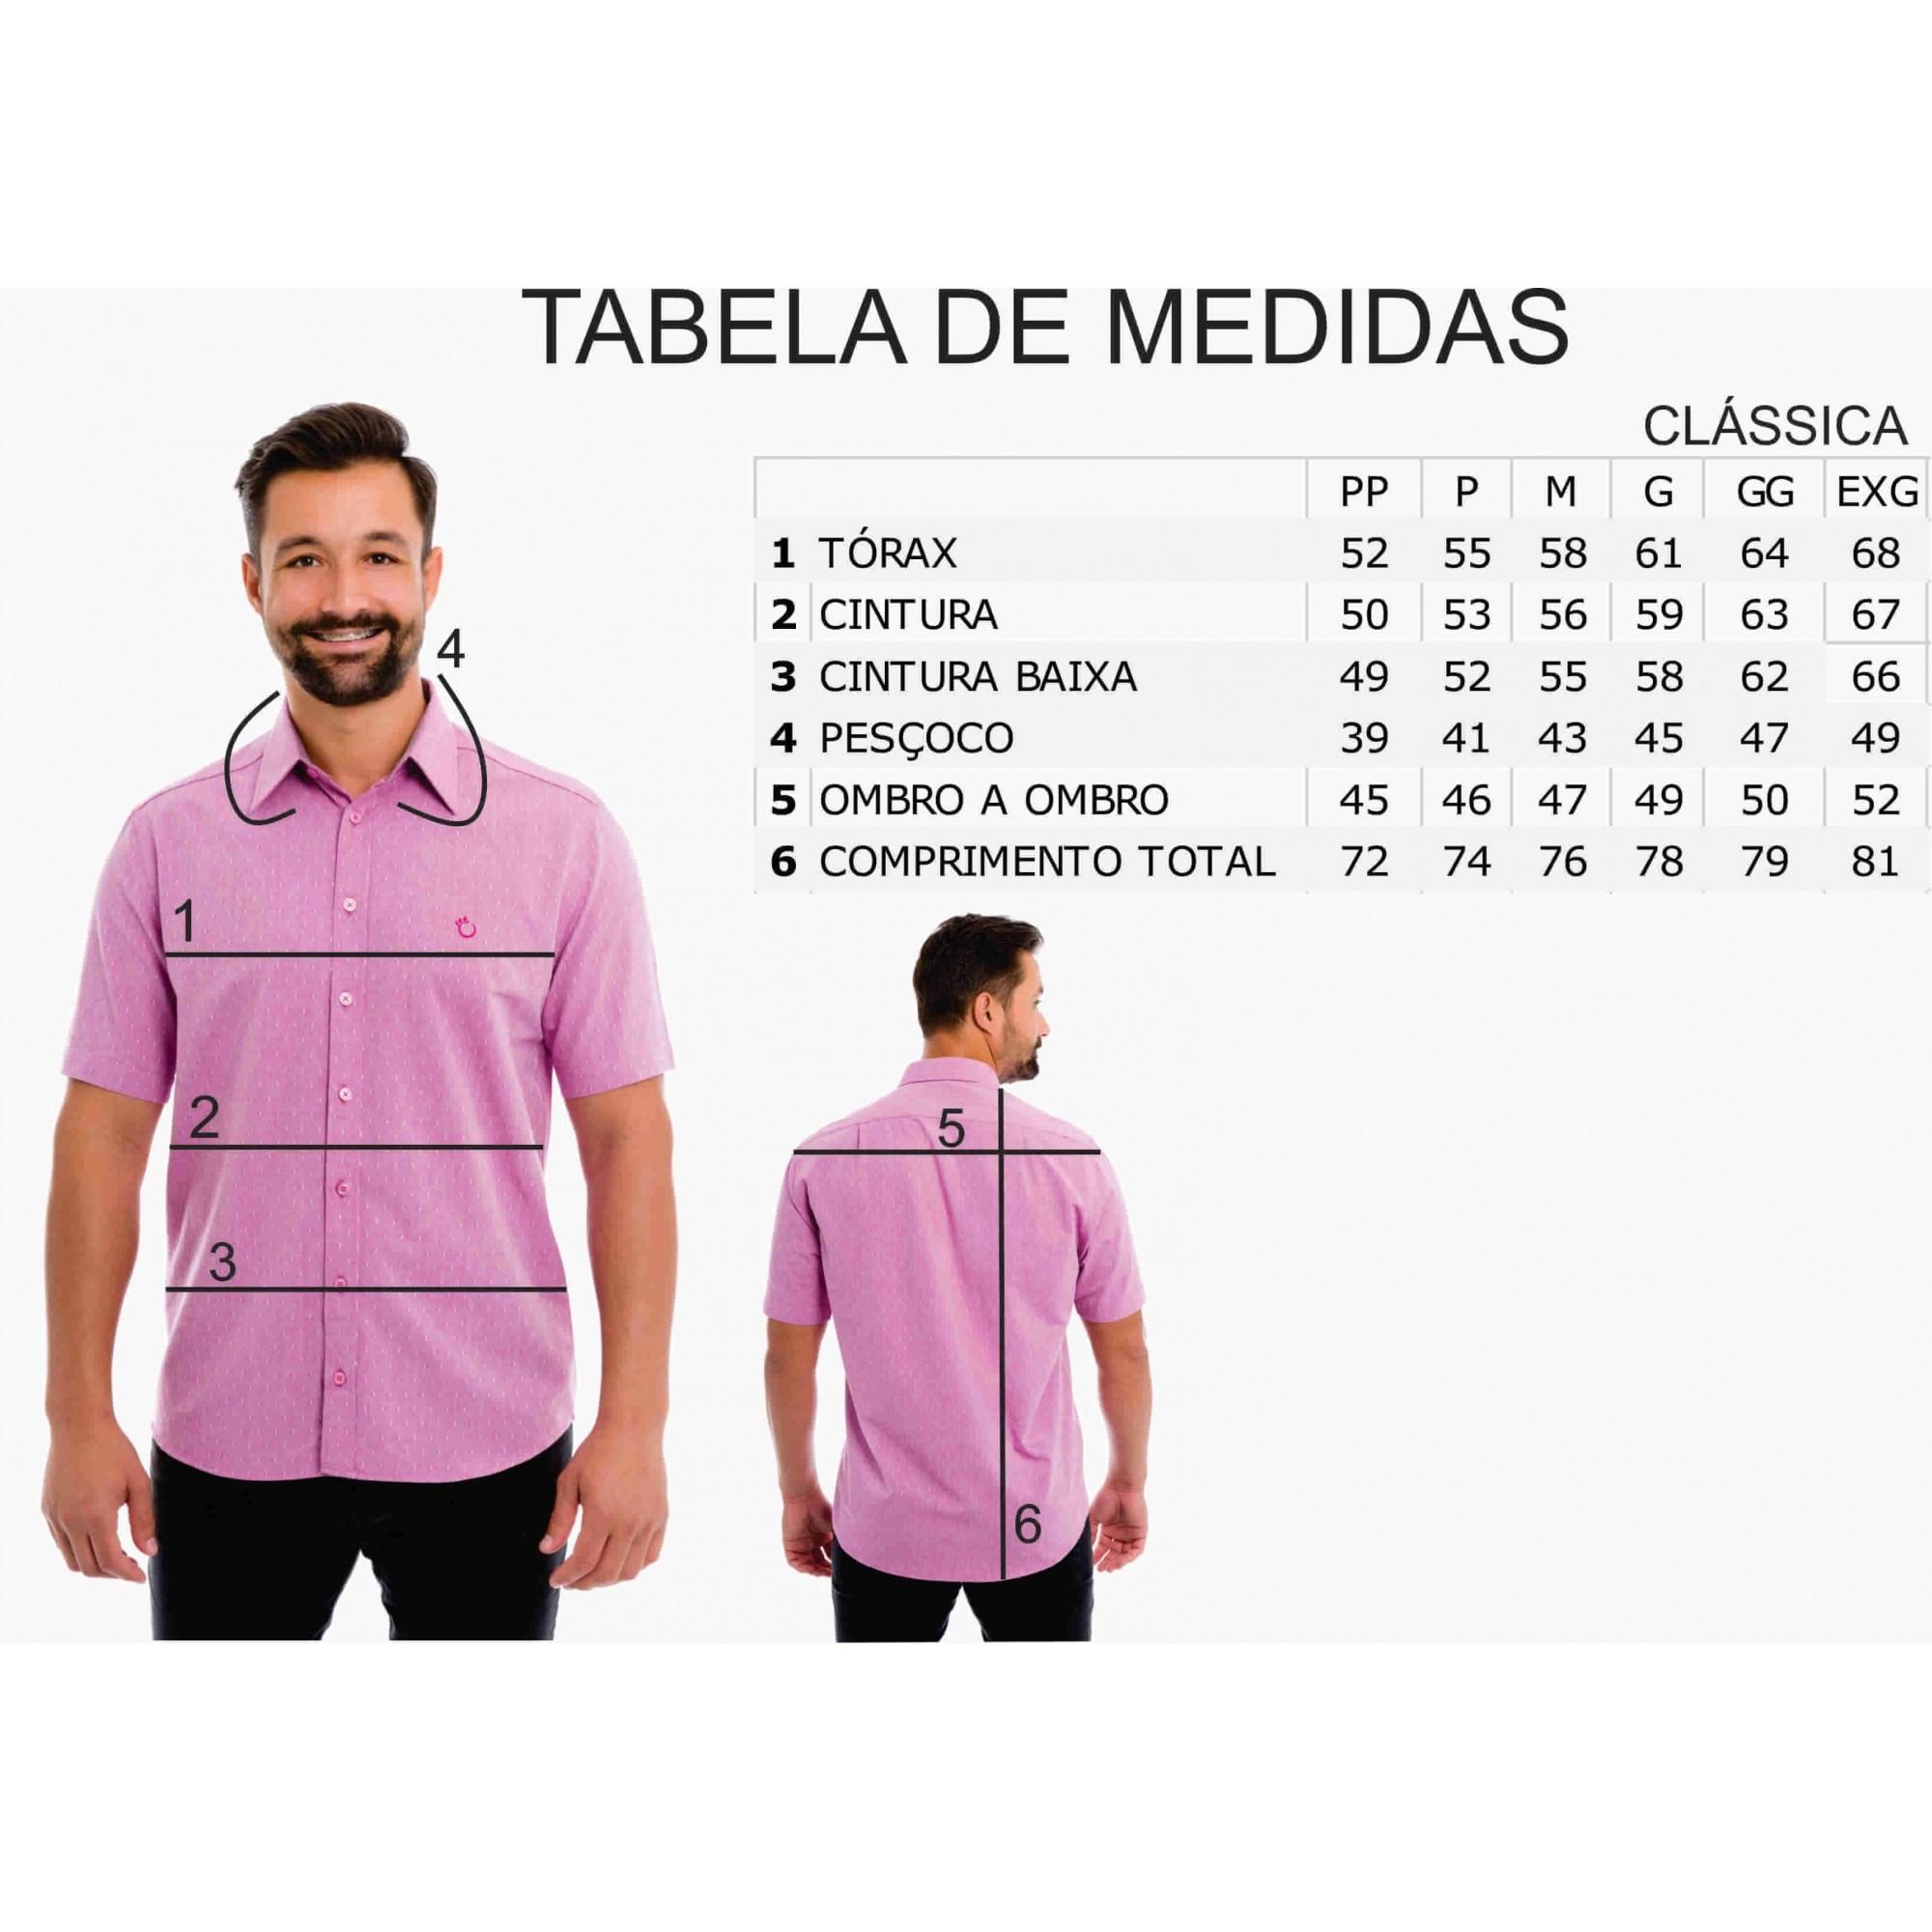 Camisa Social Olimpo Floral com Elastano Manga Curta